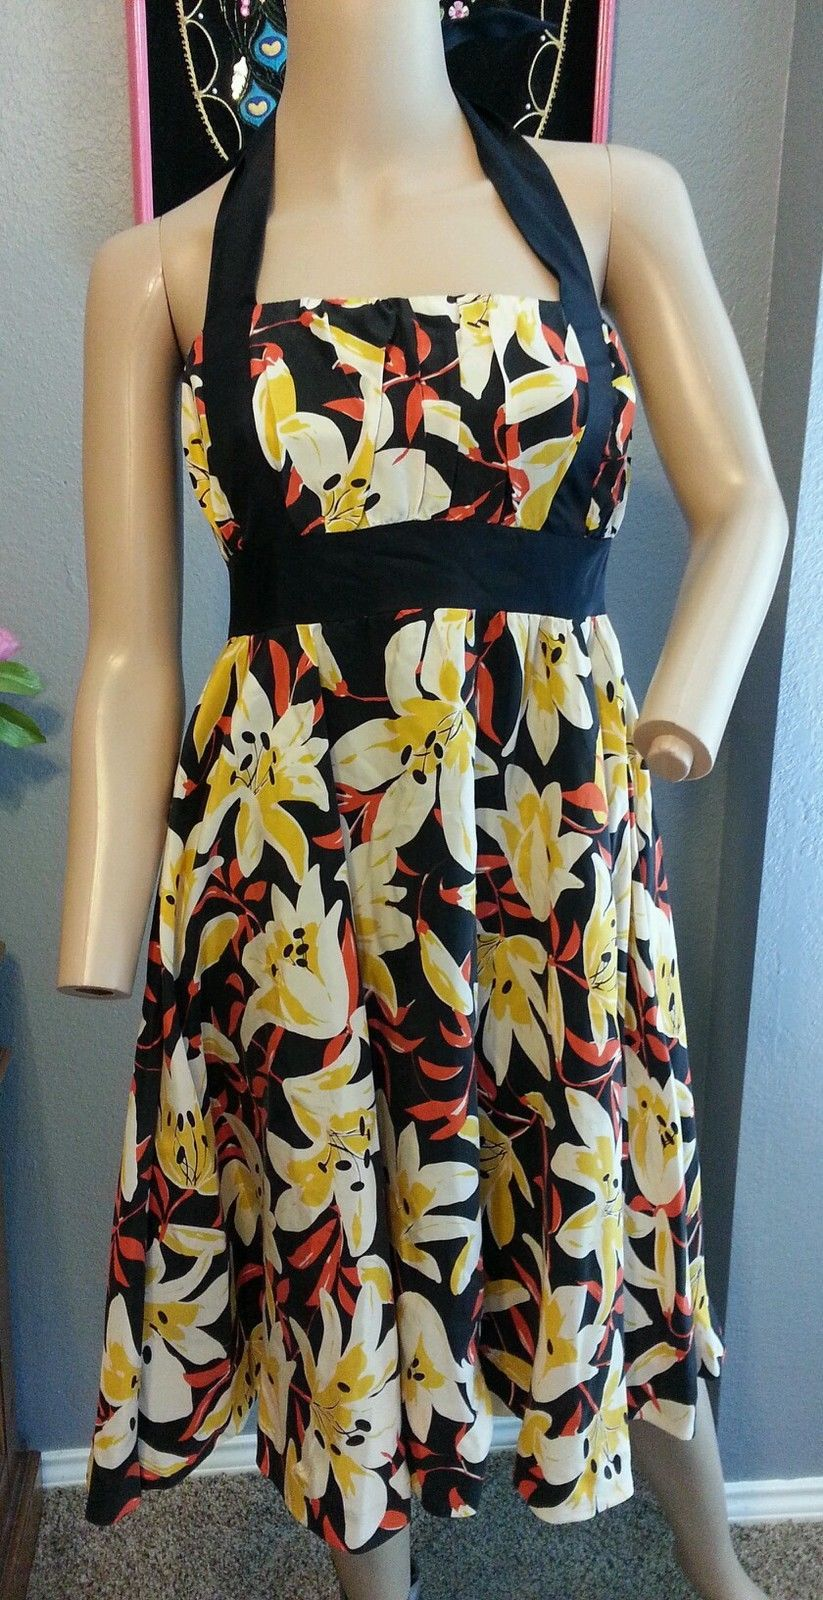 Moulinette Soeurs Floral Lilly Silk Mayflower Anthropologie Dress 0 XS - $71.24